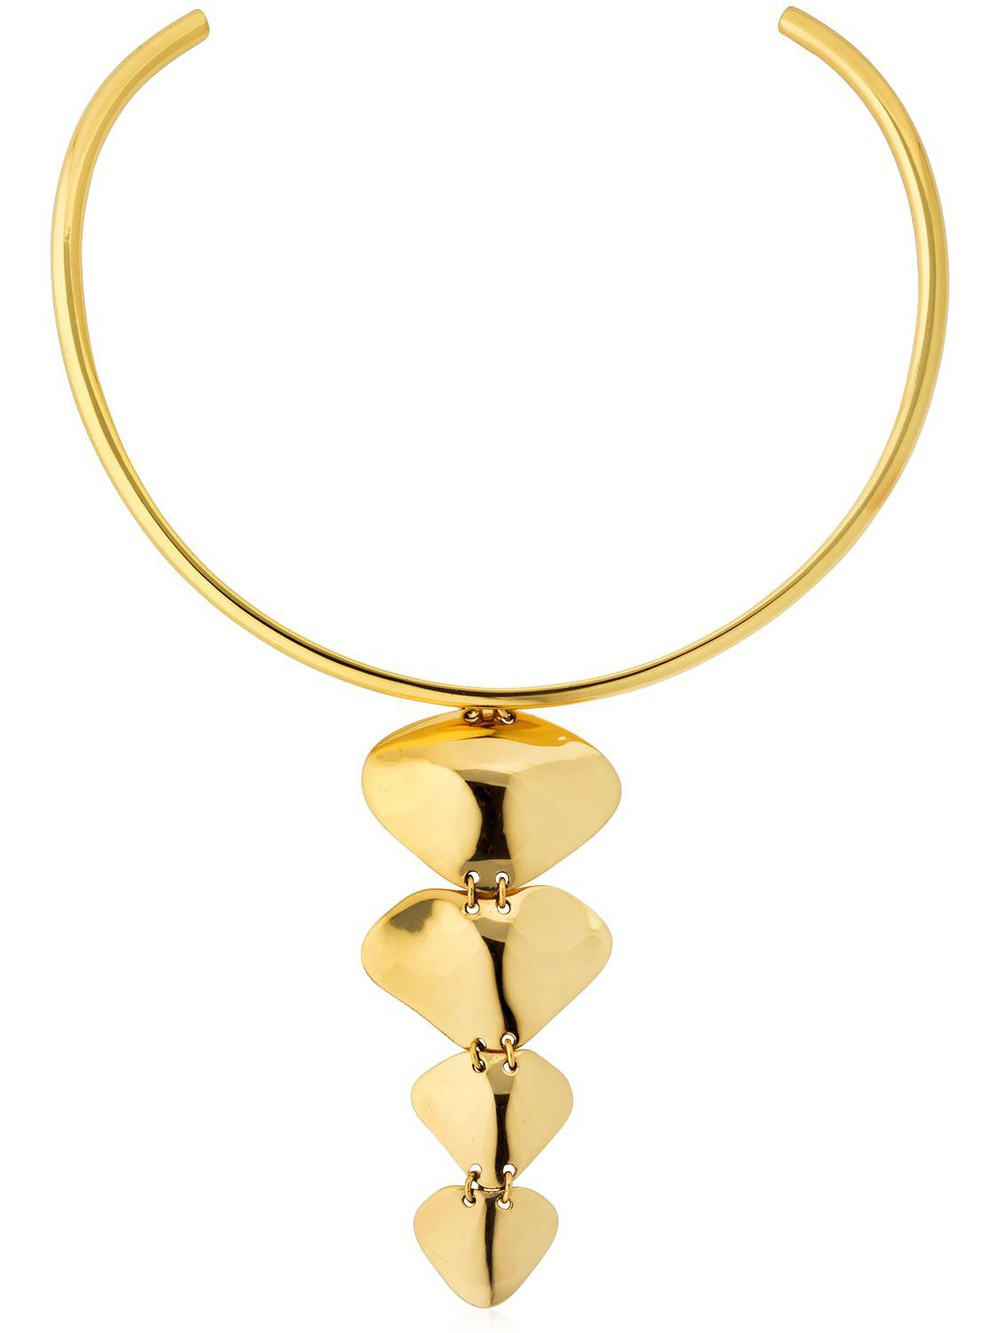 CORNELIA WEBB Molded Spine Choker in gold